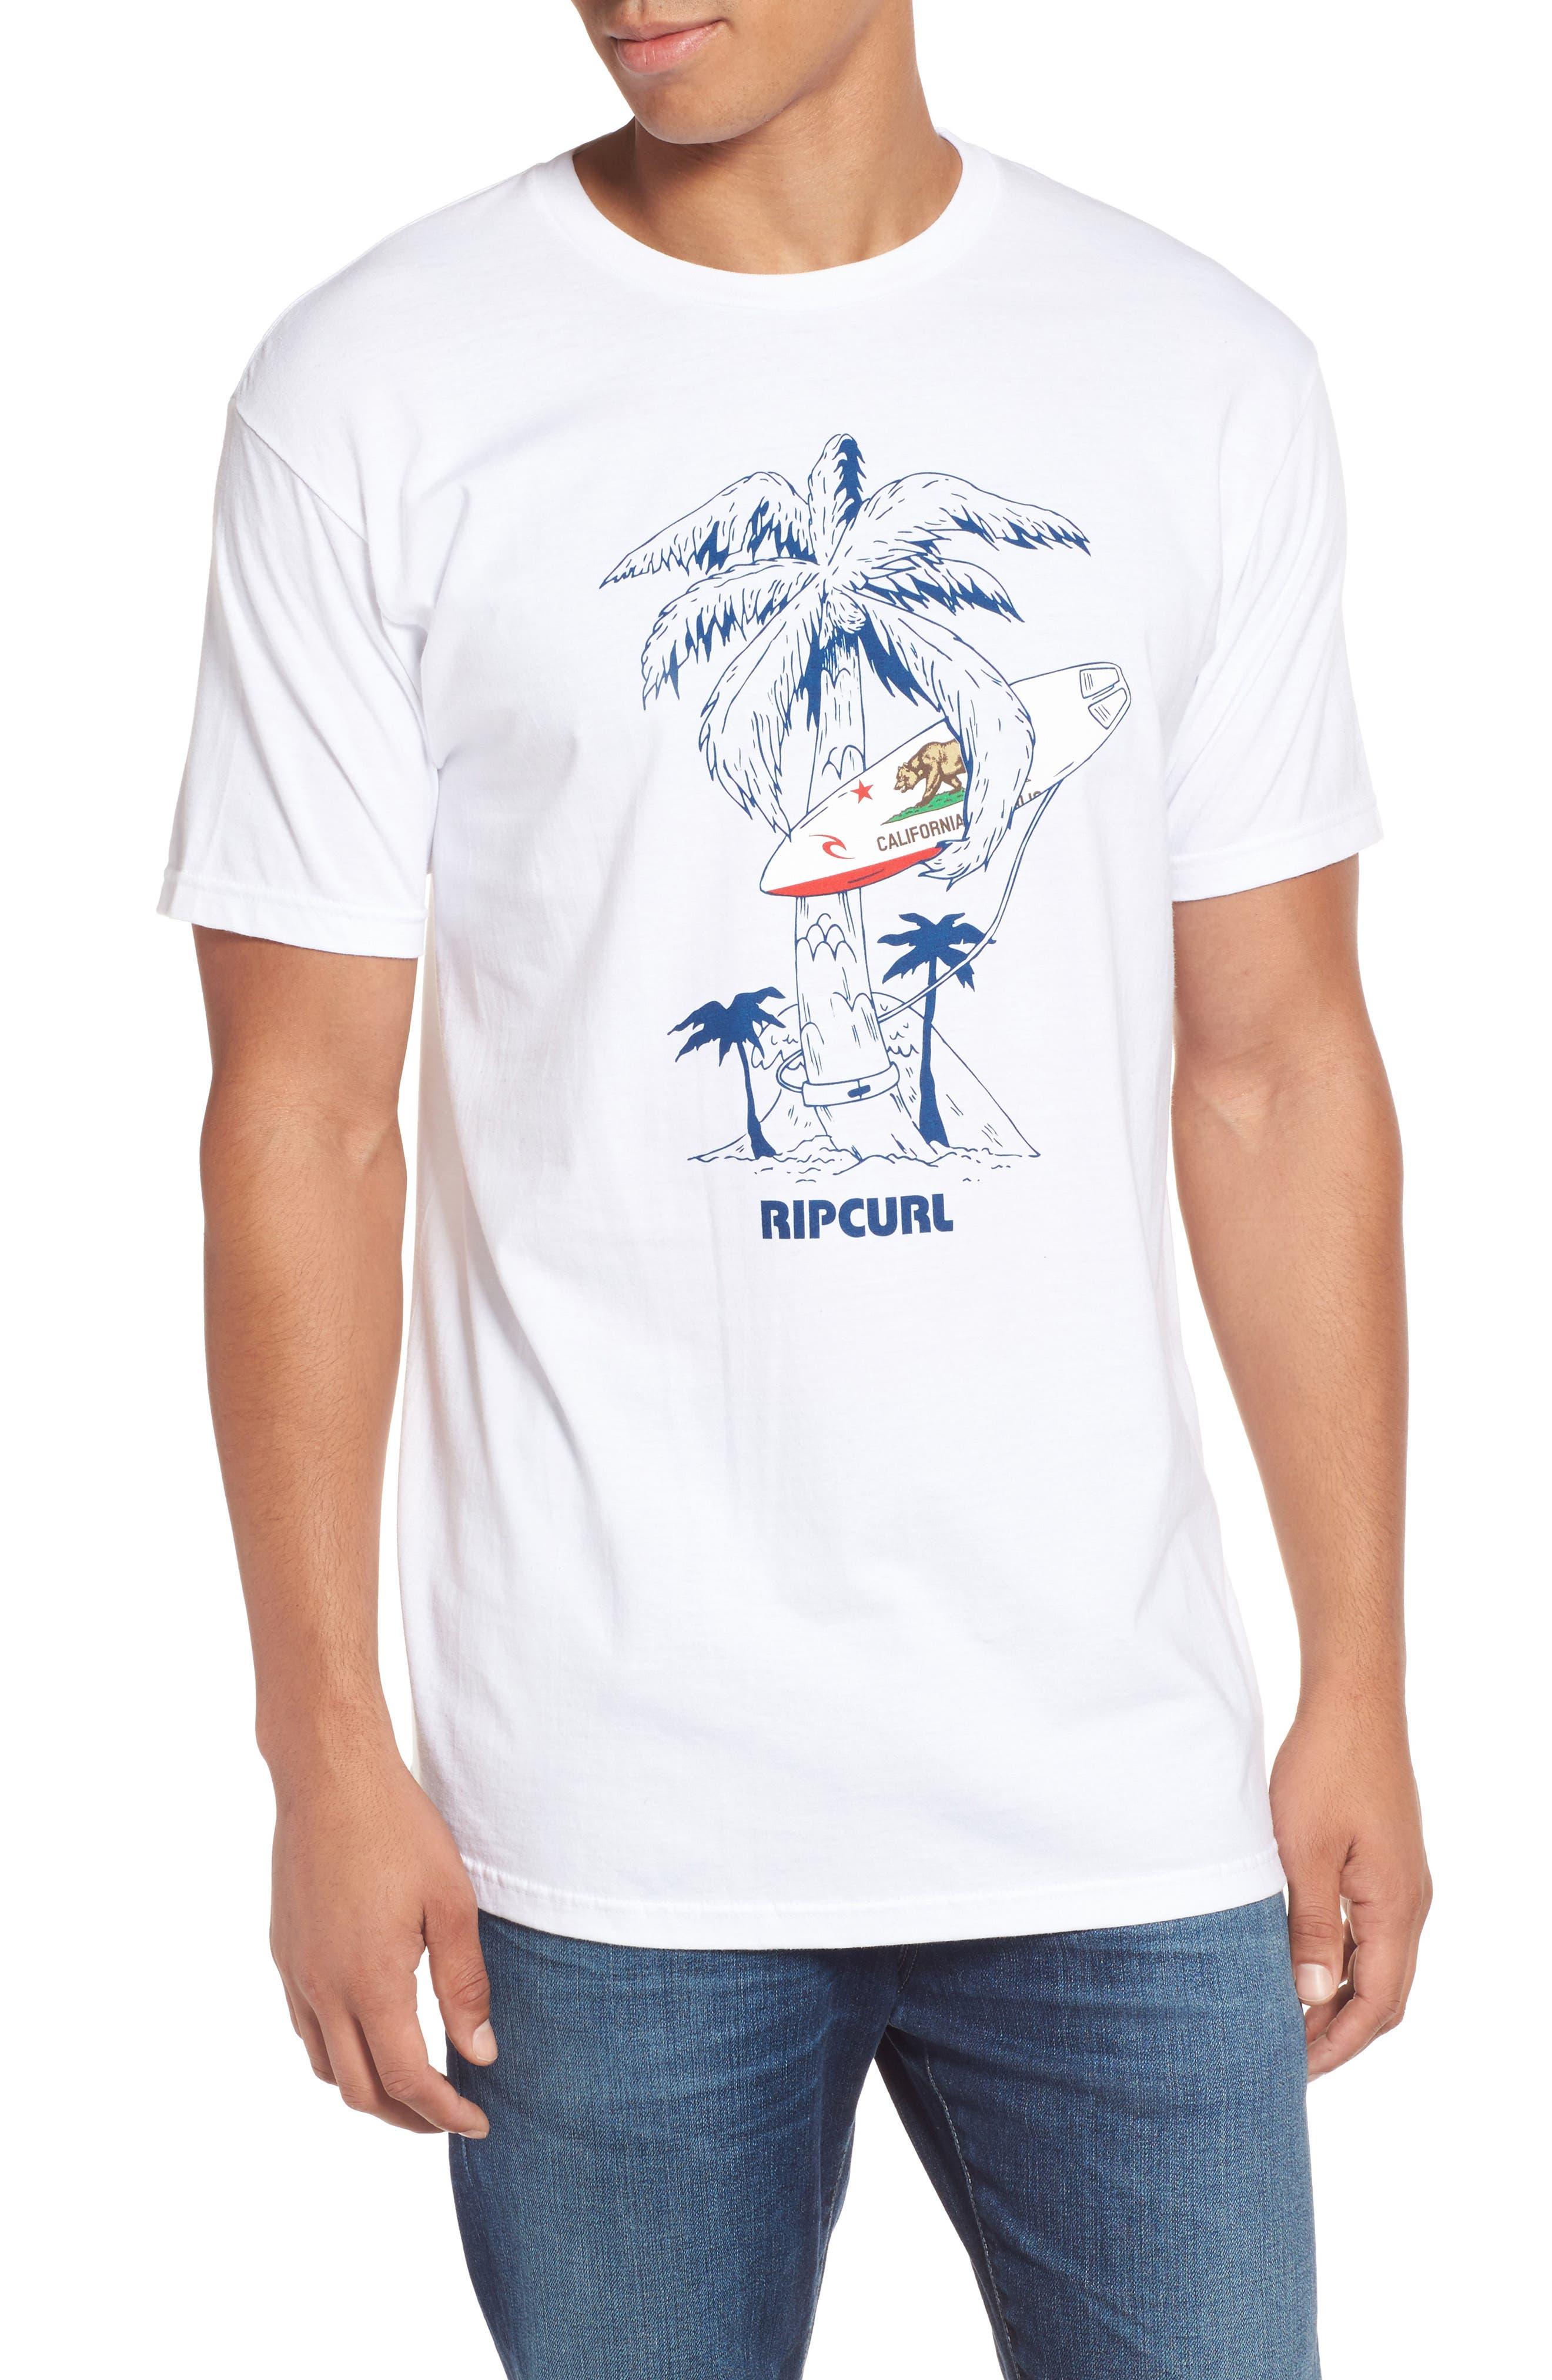 Rip Curl Cali Vibes Premium Graphic T-Shirt